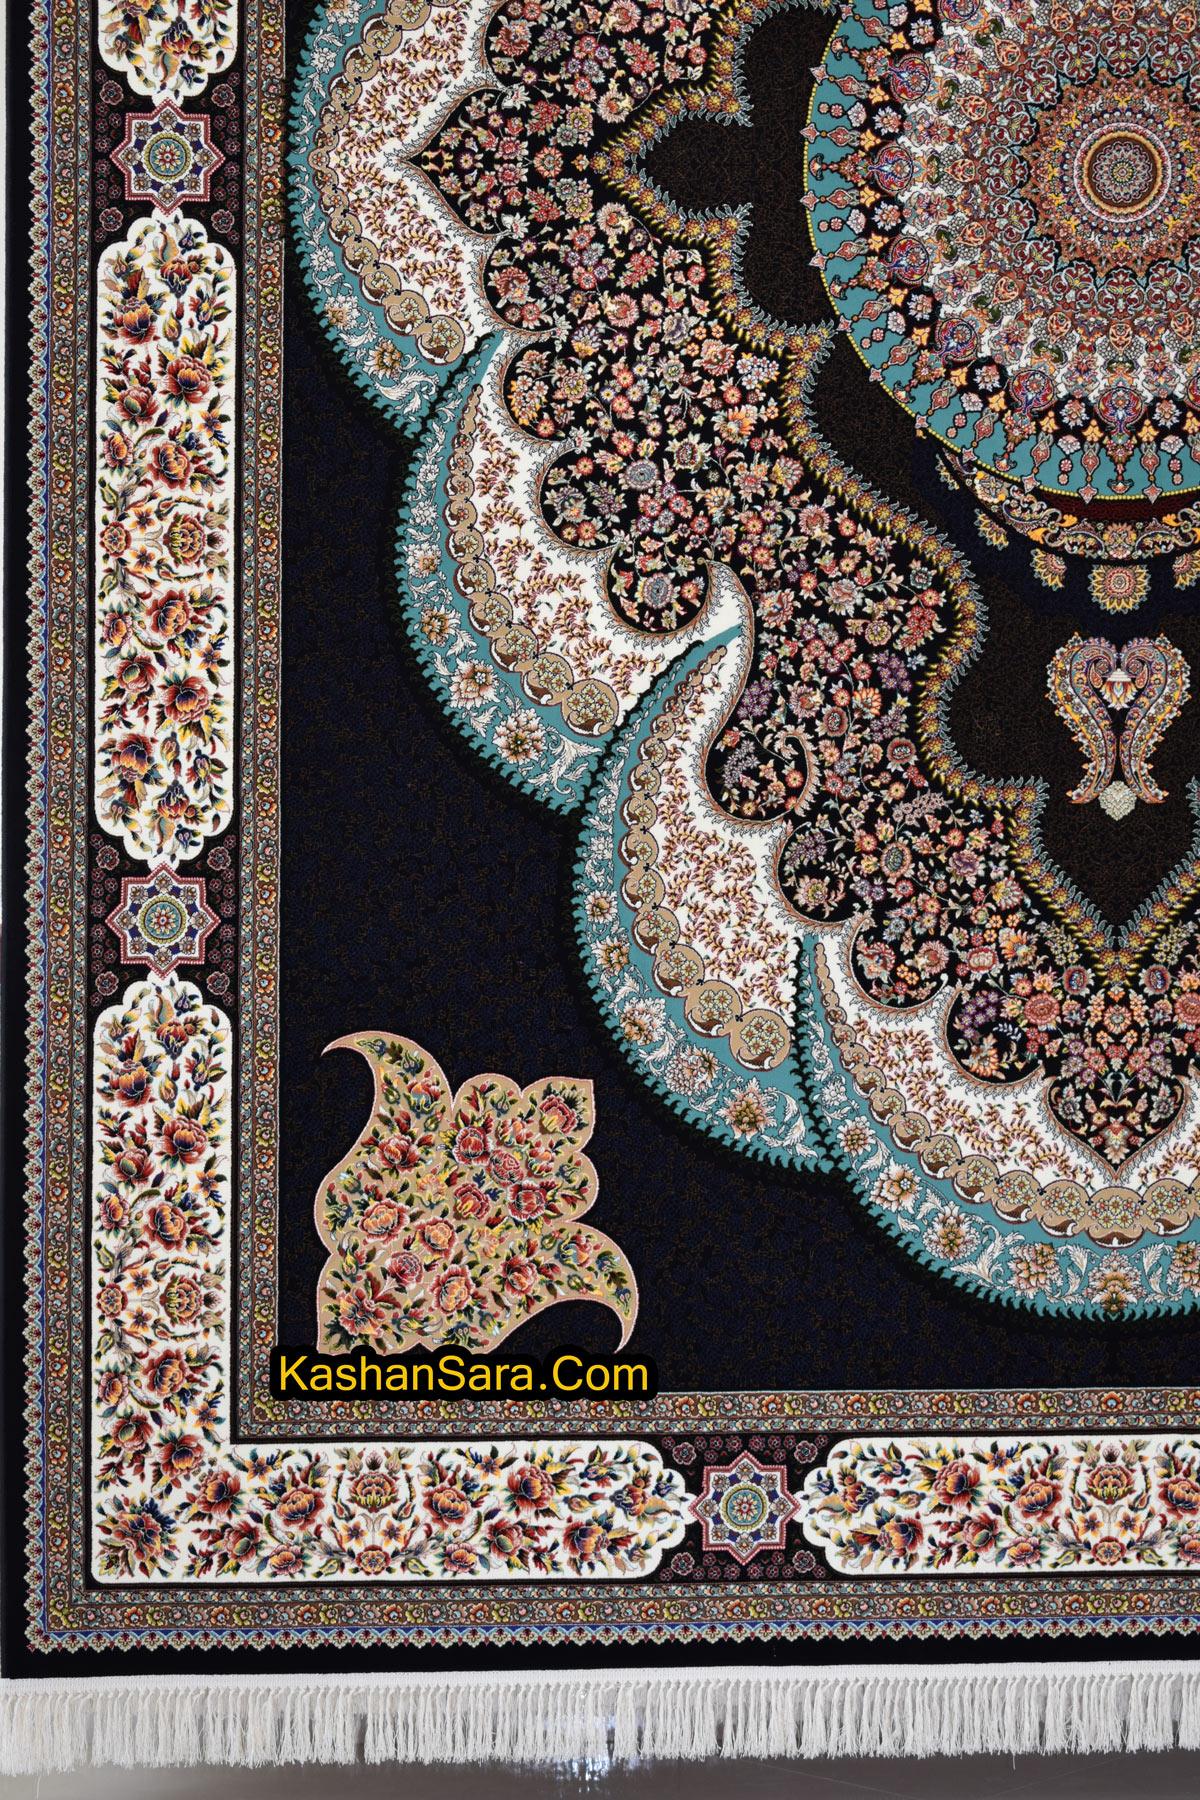 قیمت فرش ۱۰۰۰ شانه ارشیدا